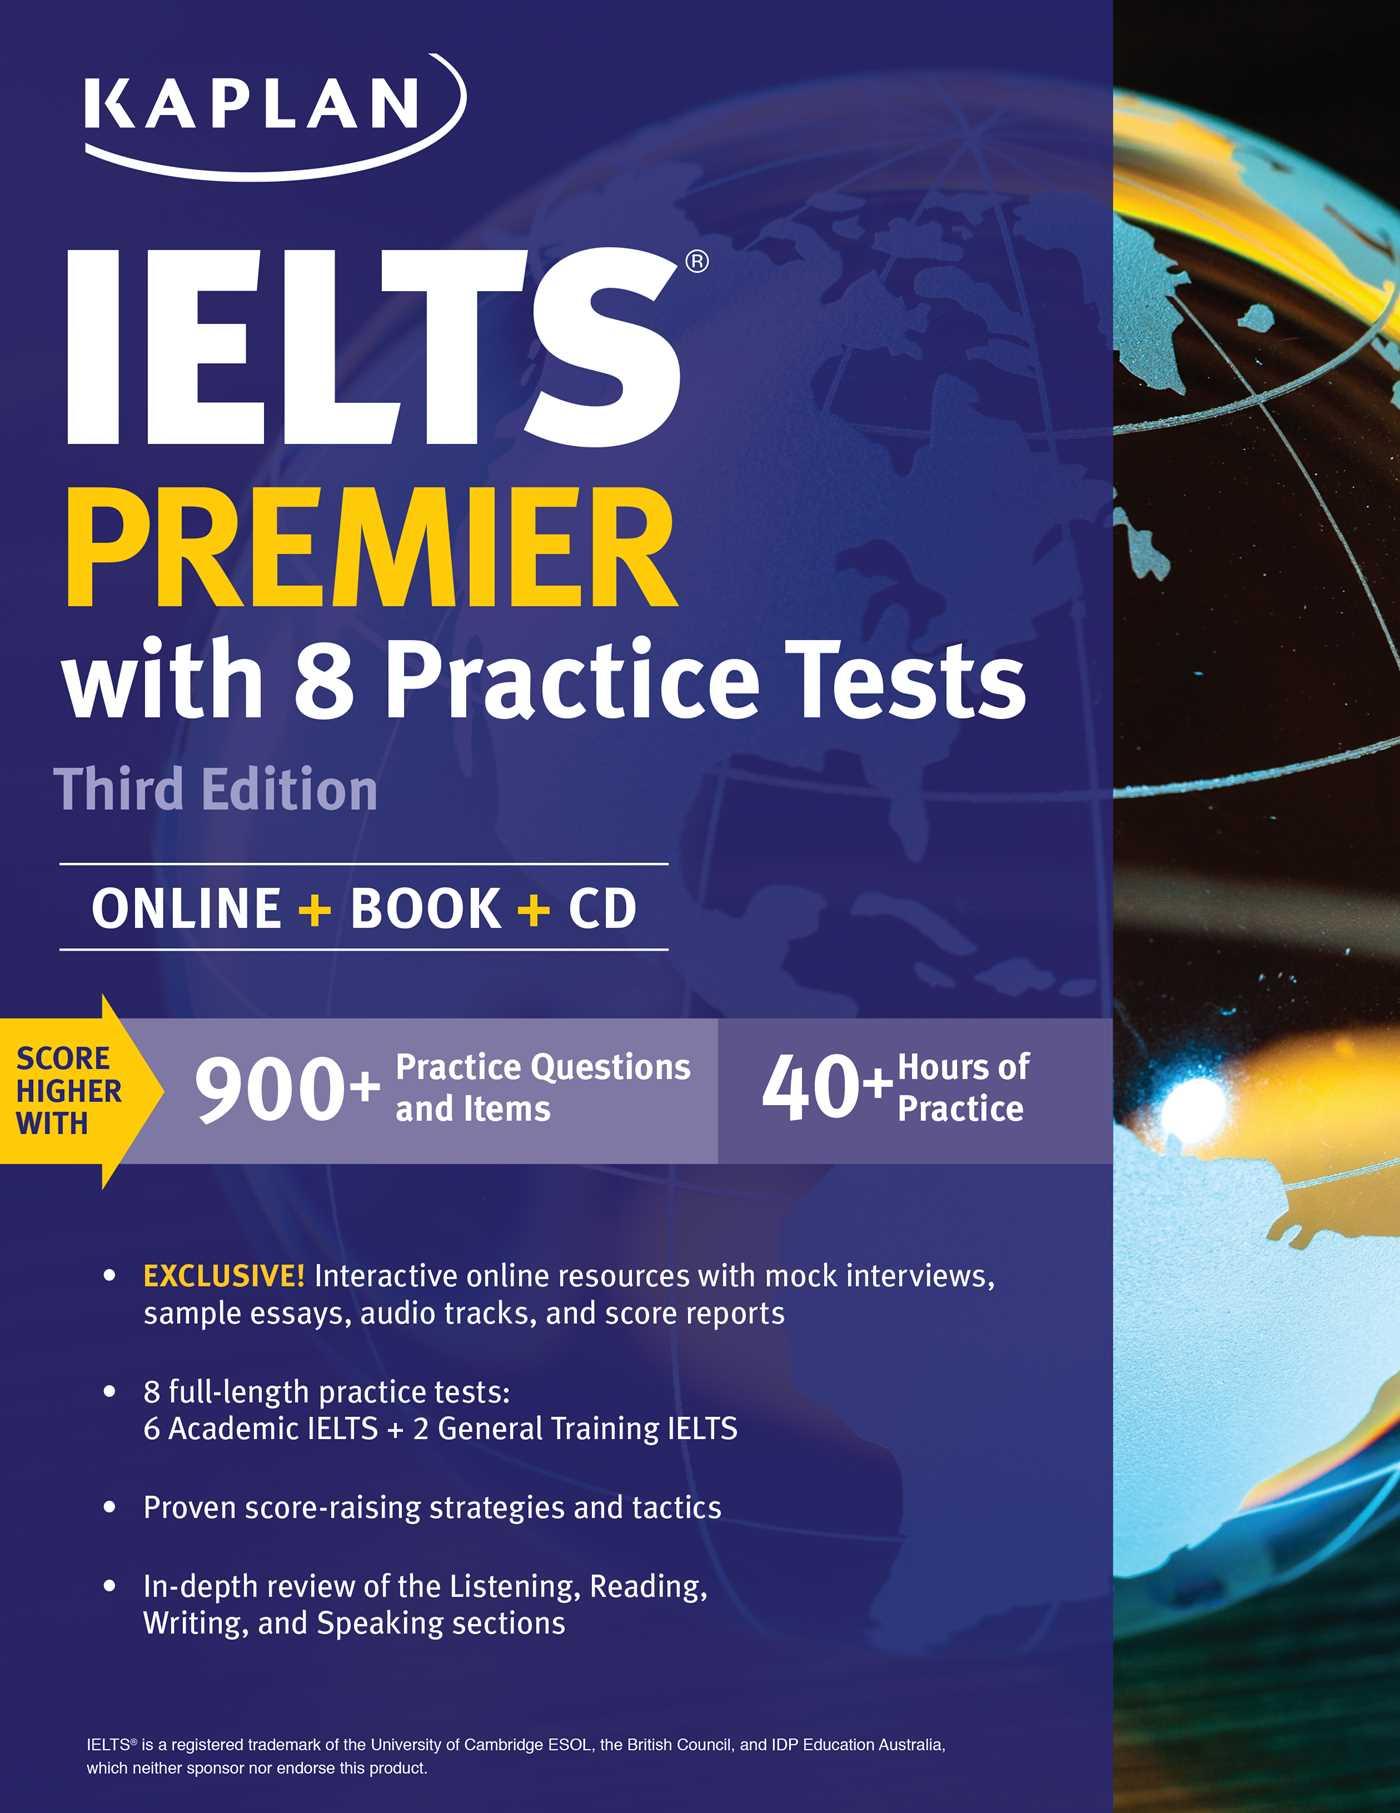 IELTS Preparation | Kaplan Test Prep